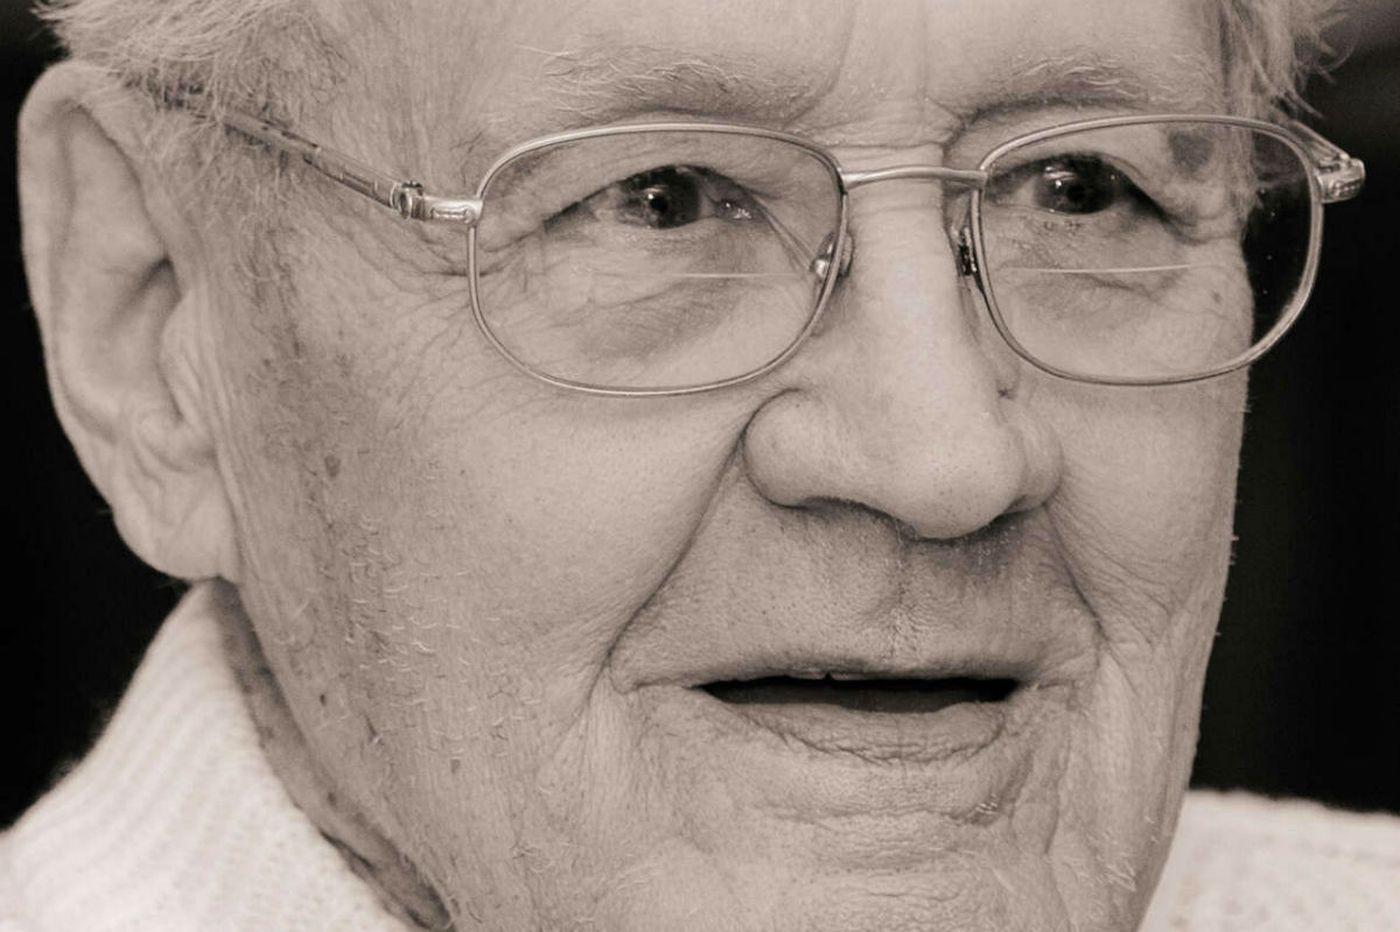 James Wallace Rapp, 92, civic leader in Malvern